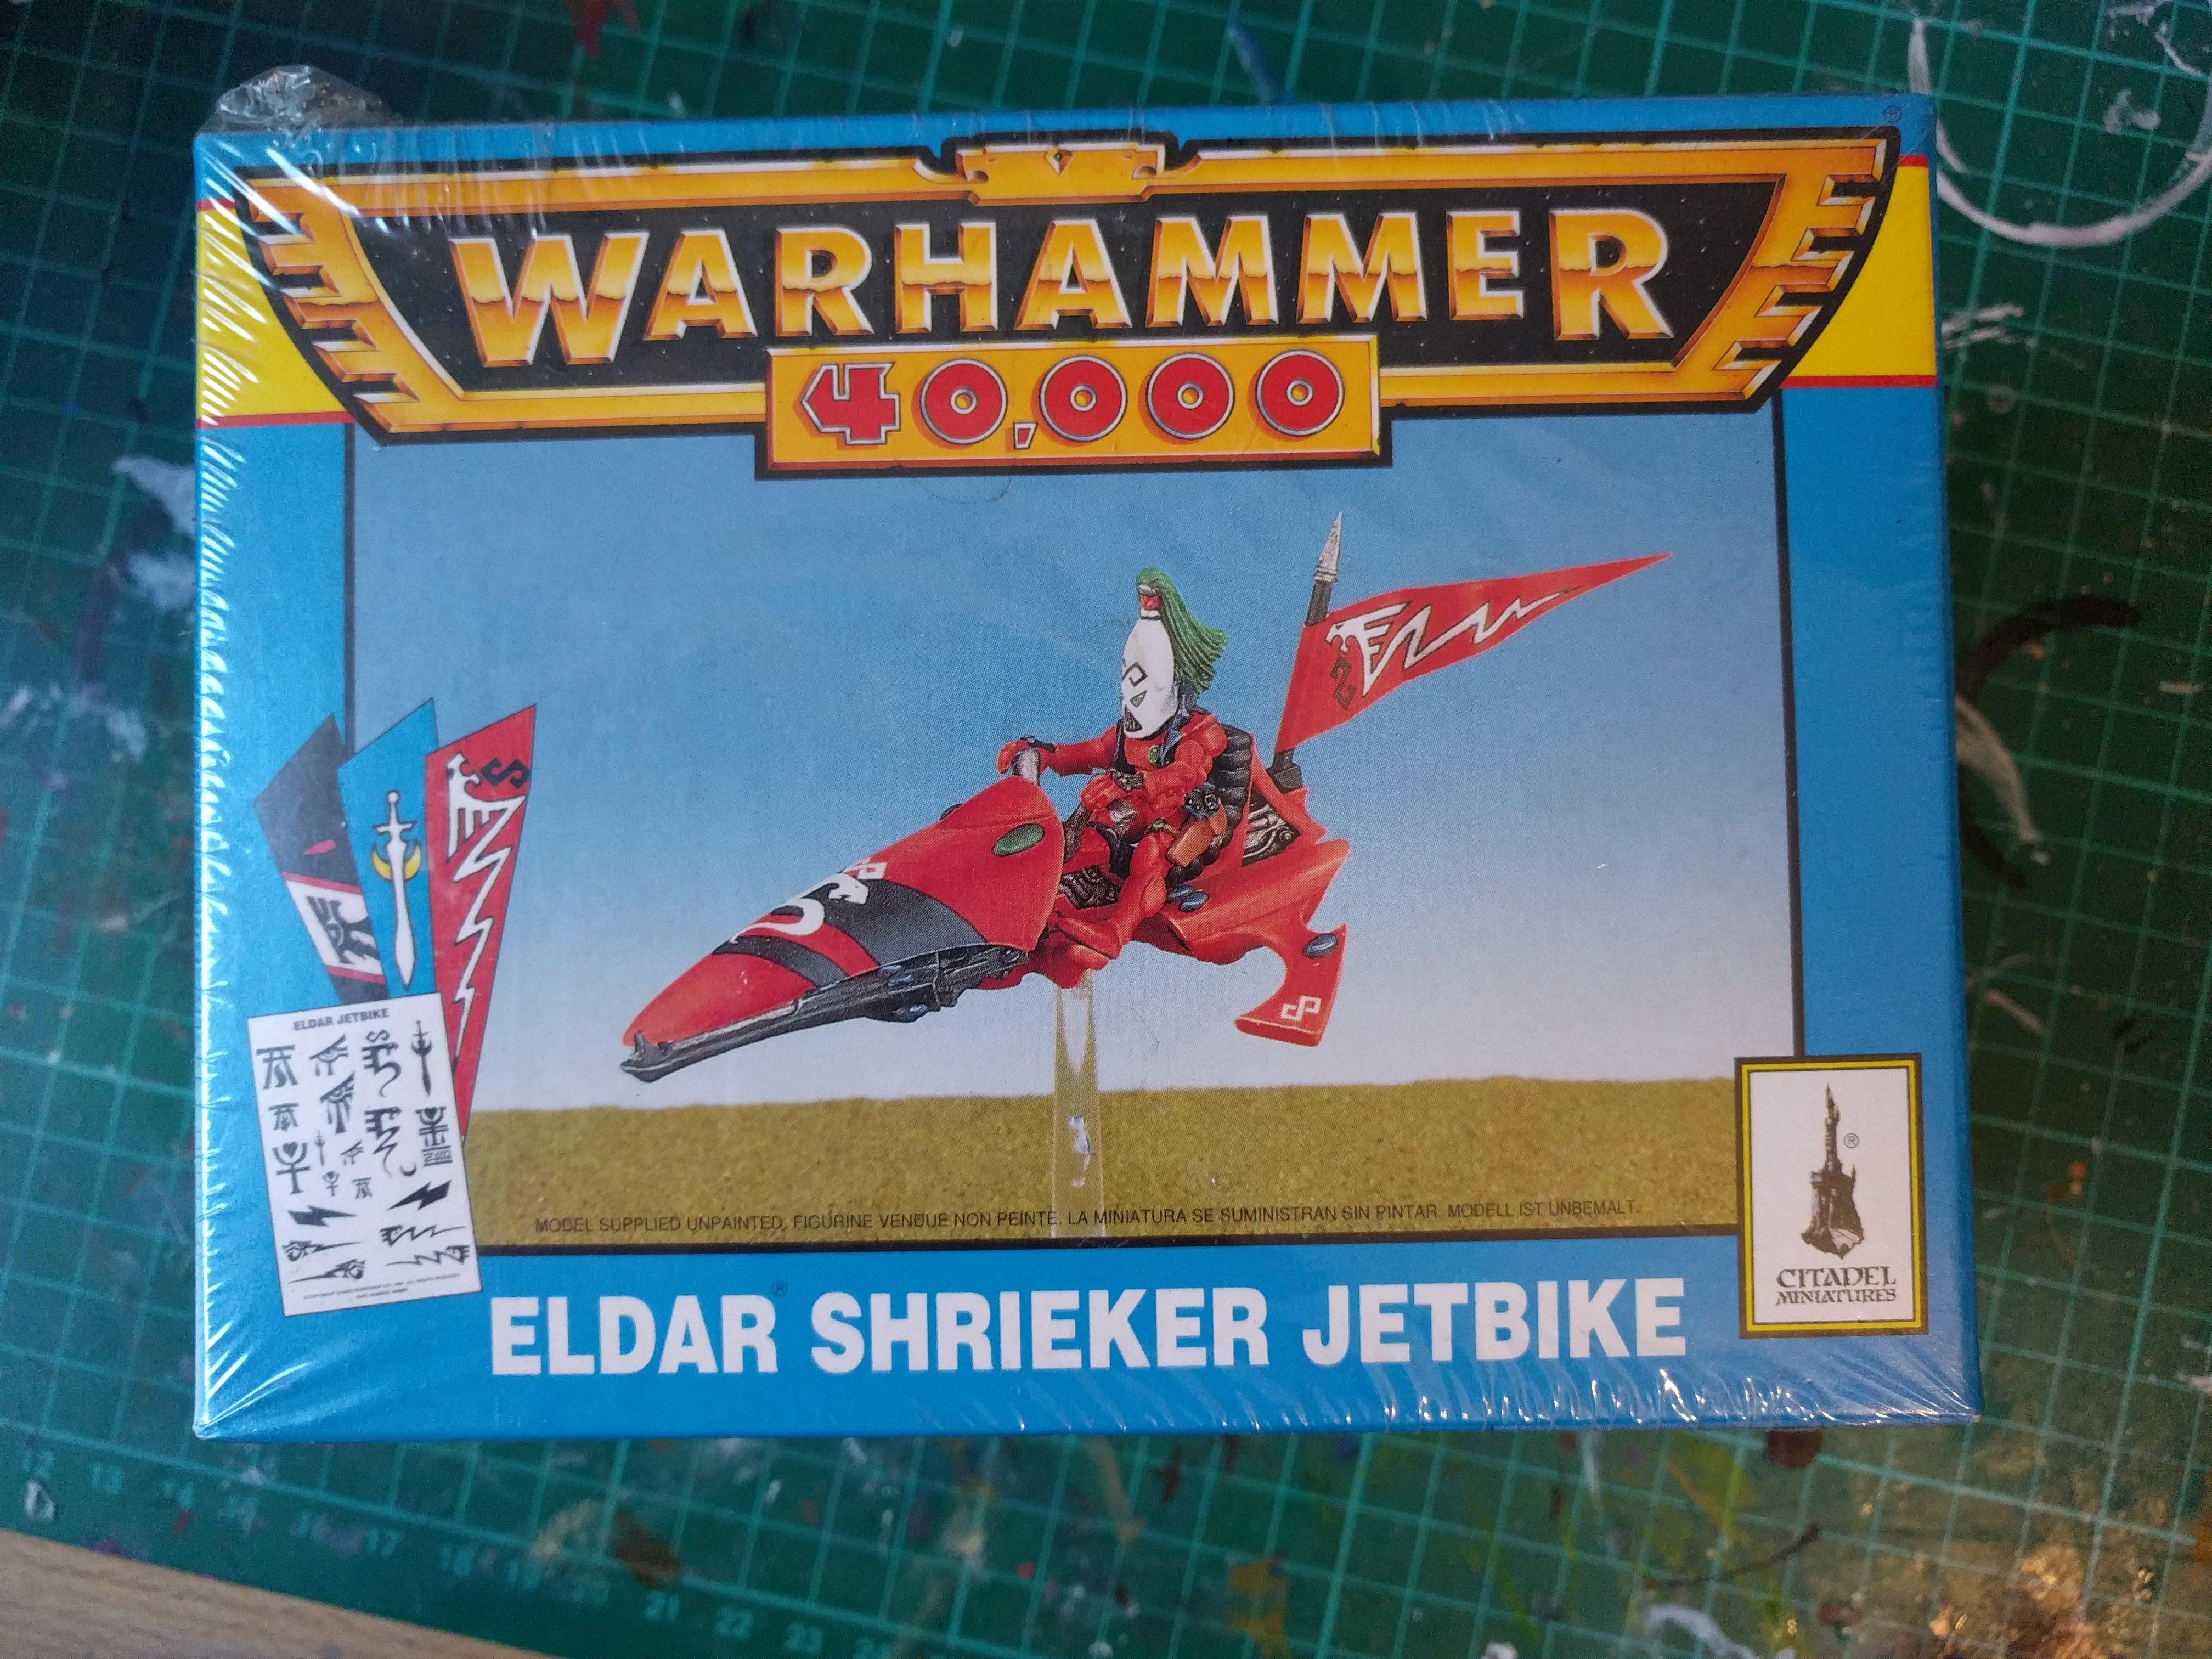 Eldar Shrieker Jetbike